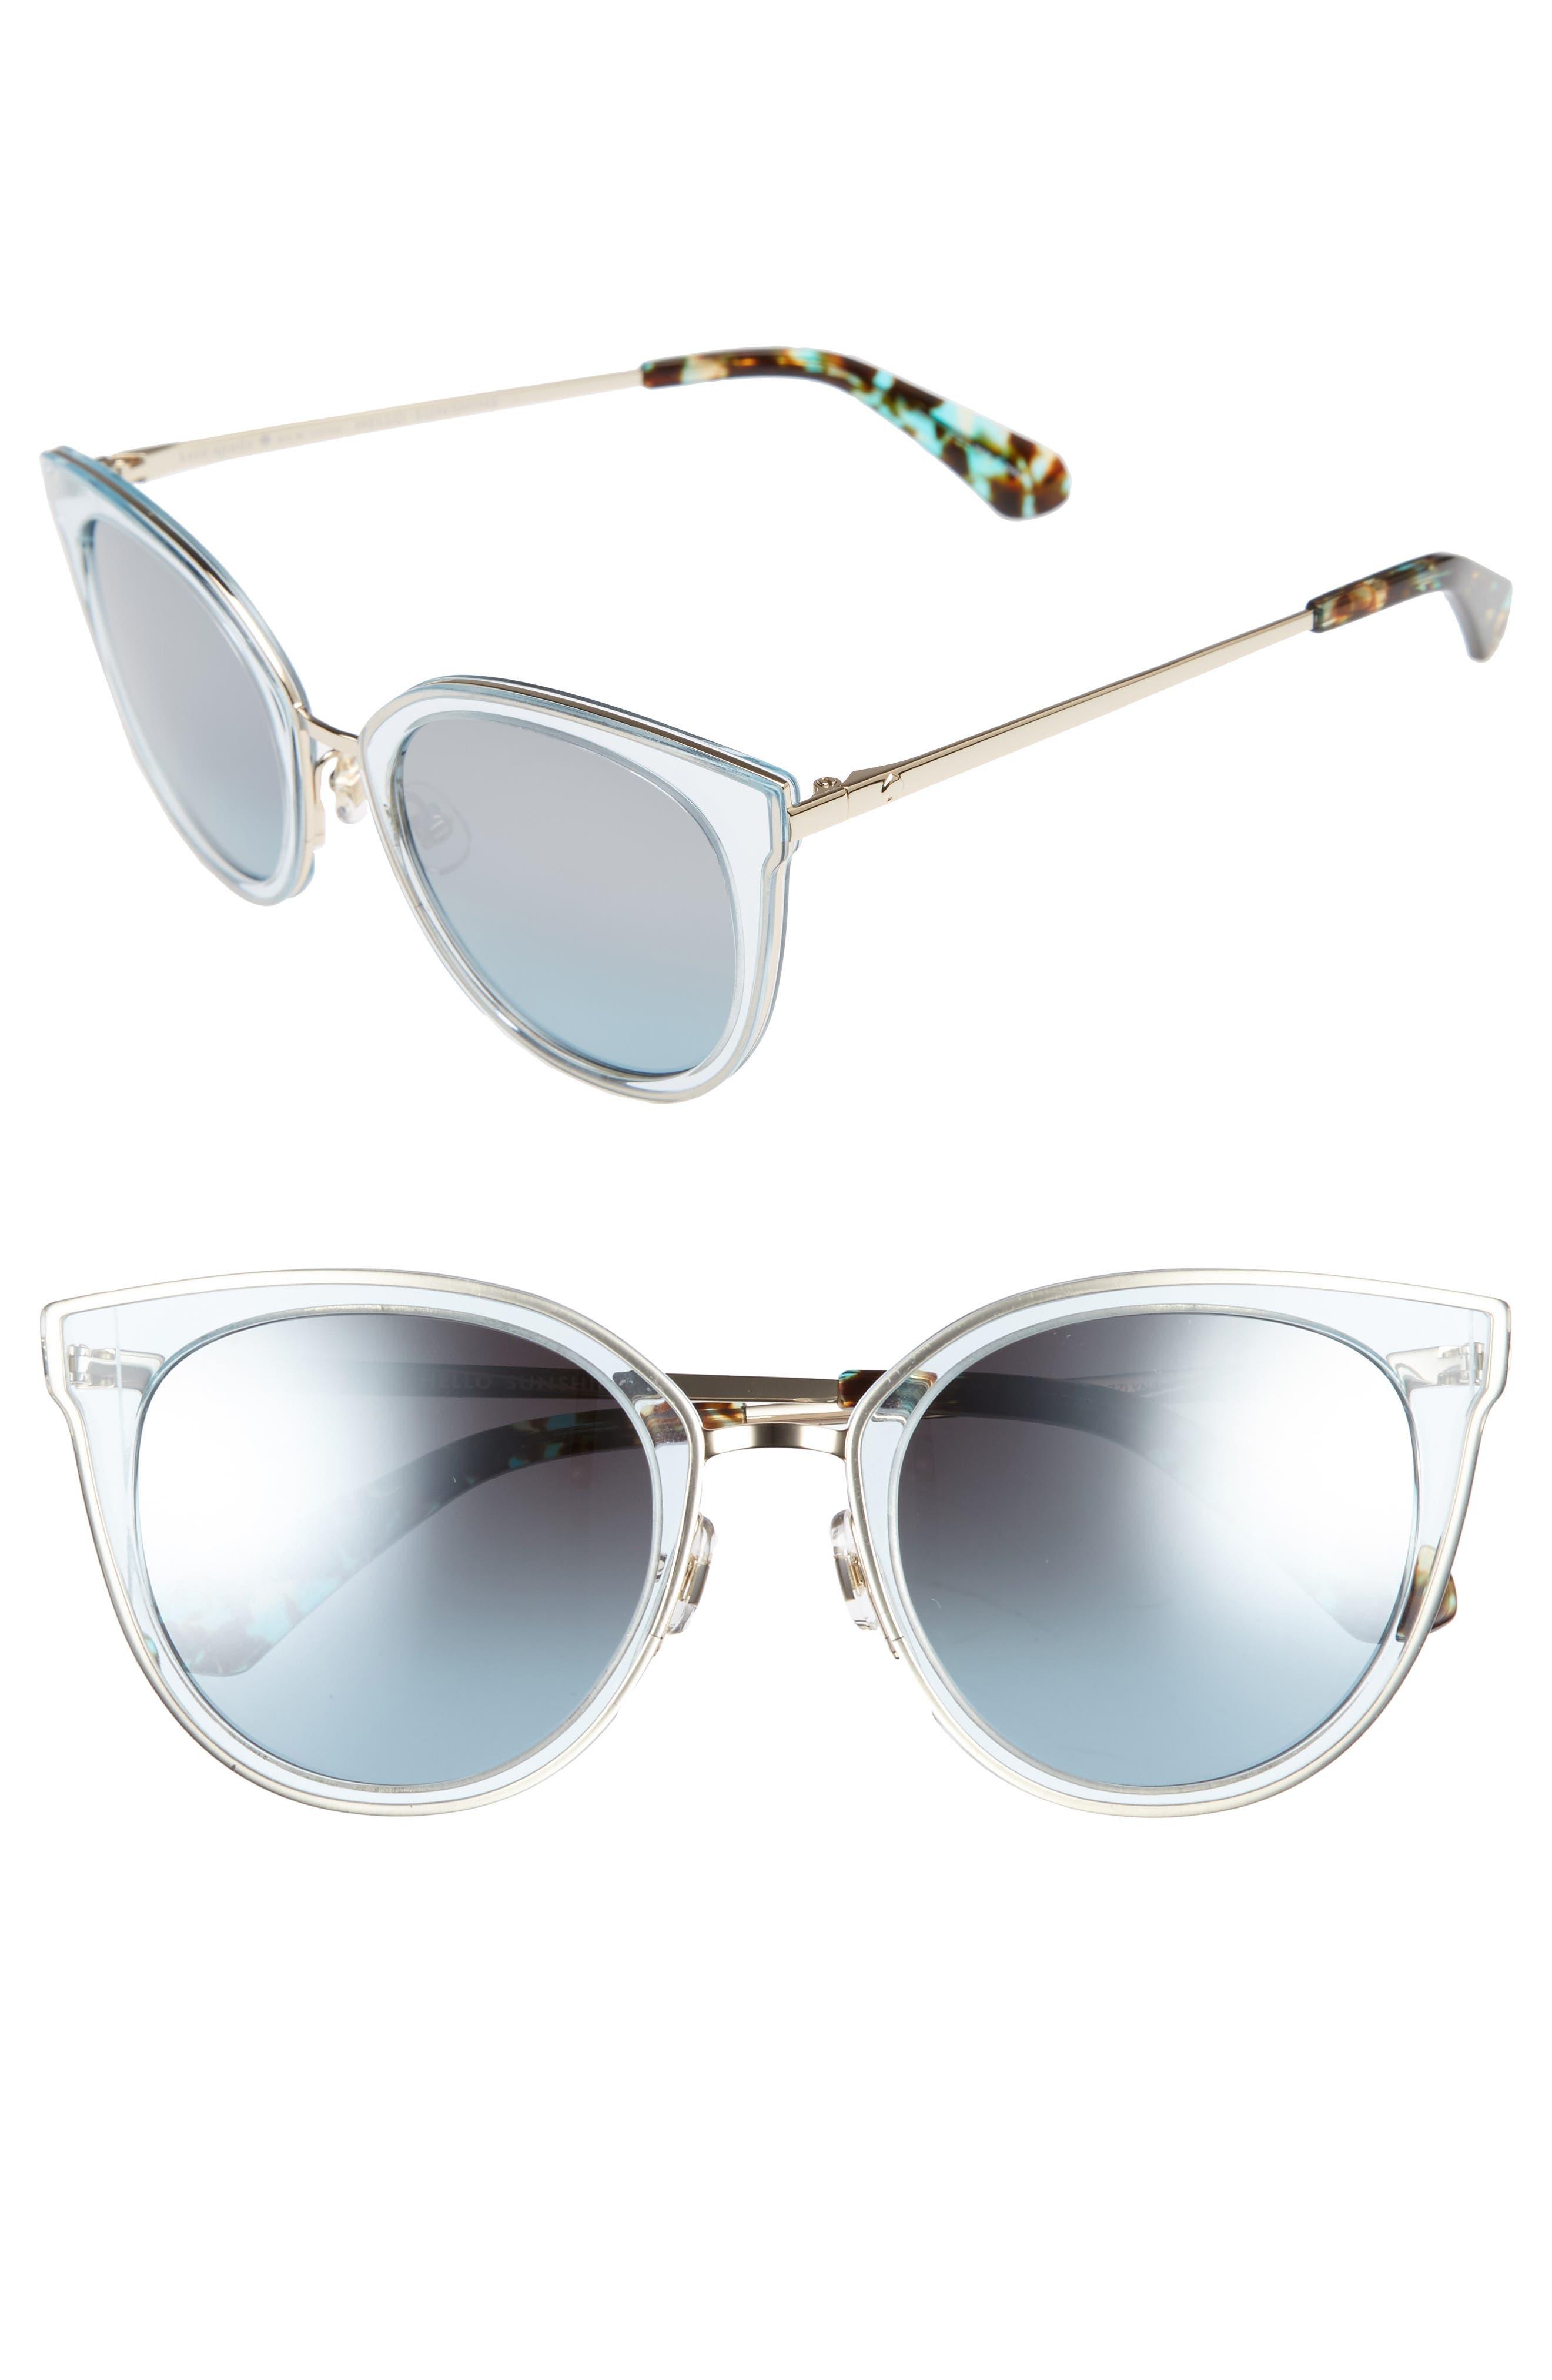 jazzlyn 51mm Cat Eye Sunglasses,                         Main,                         color, Blue/ Gold